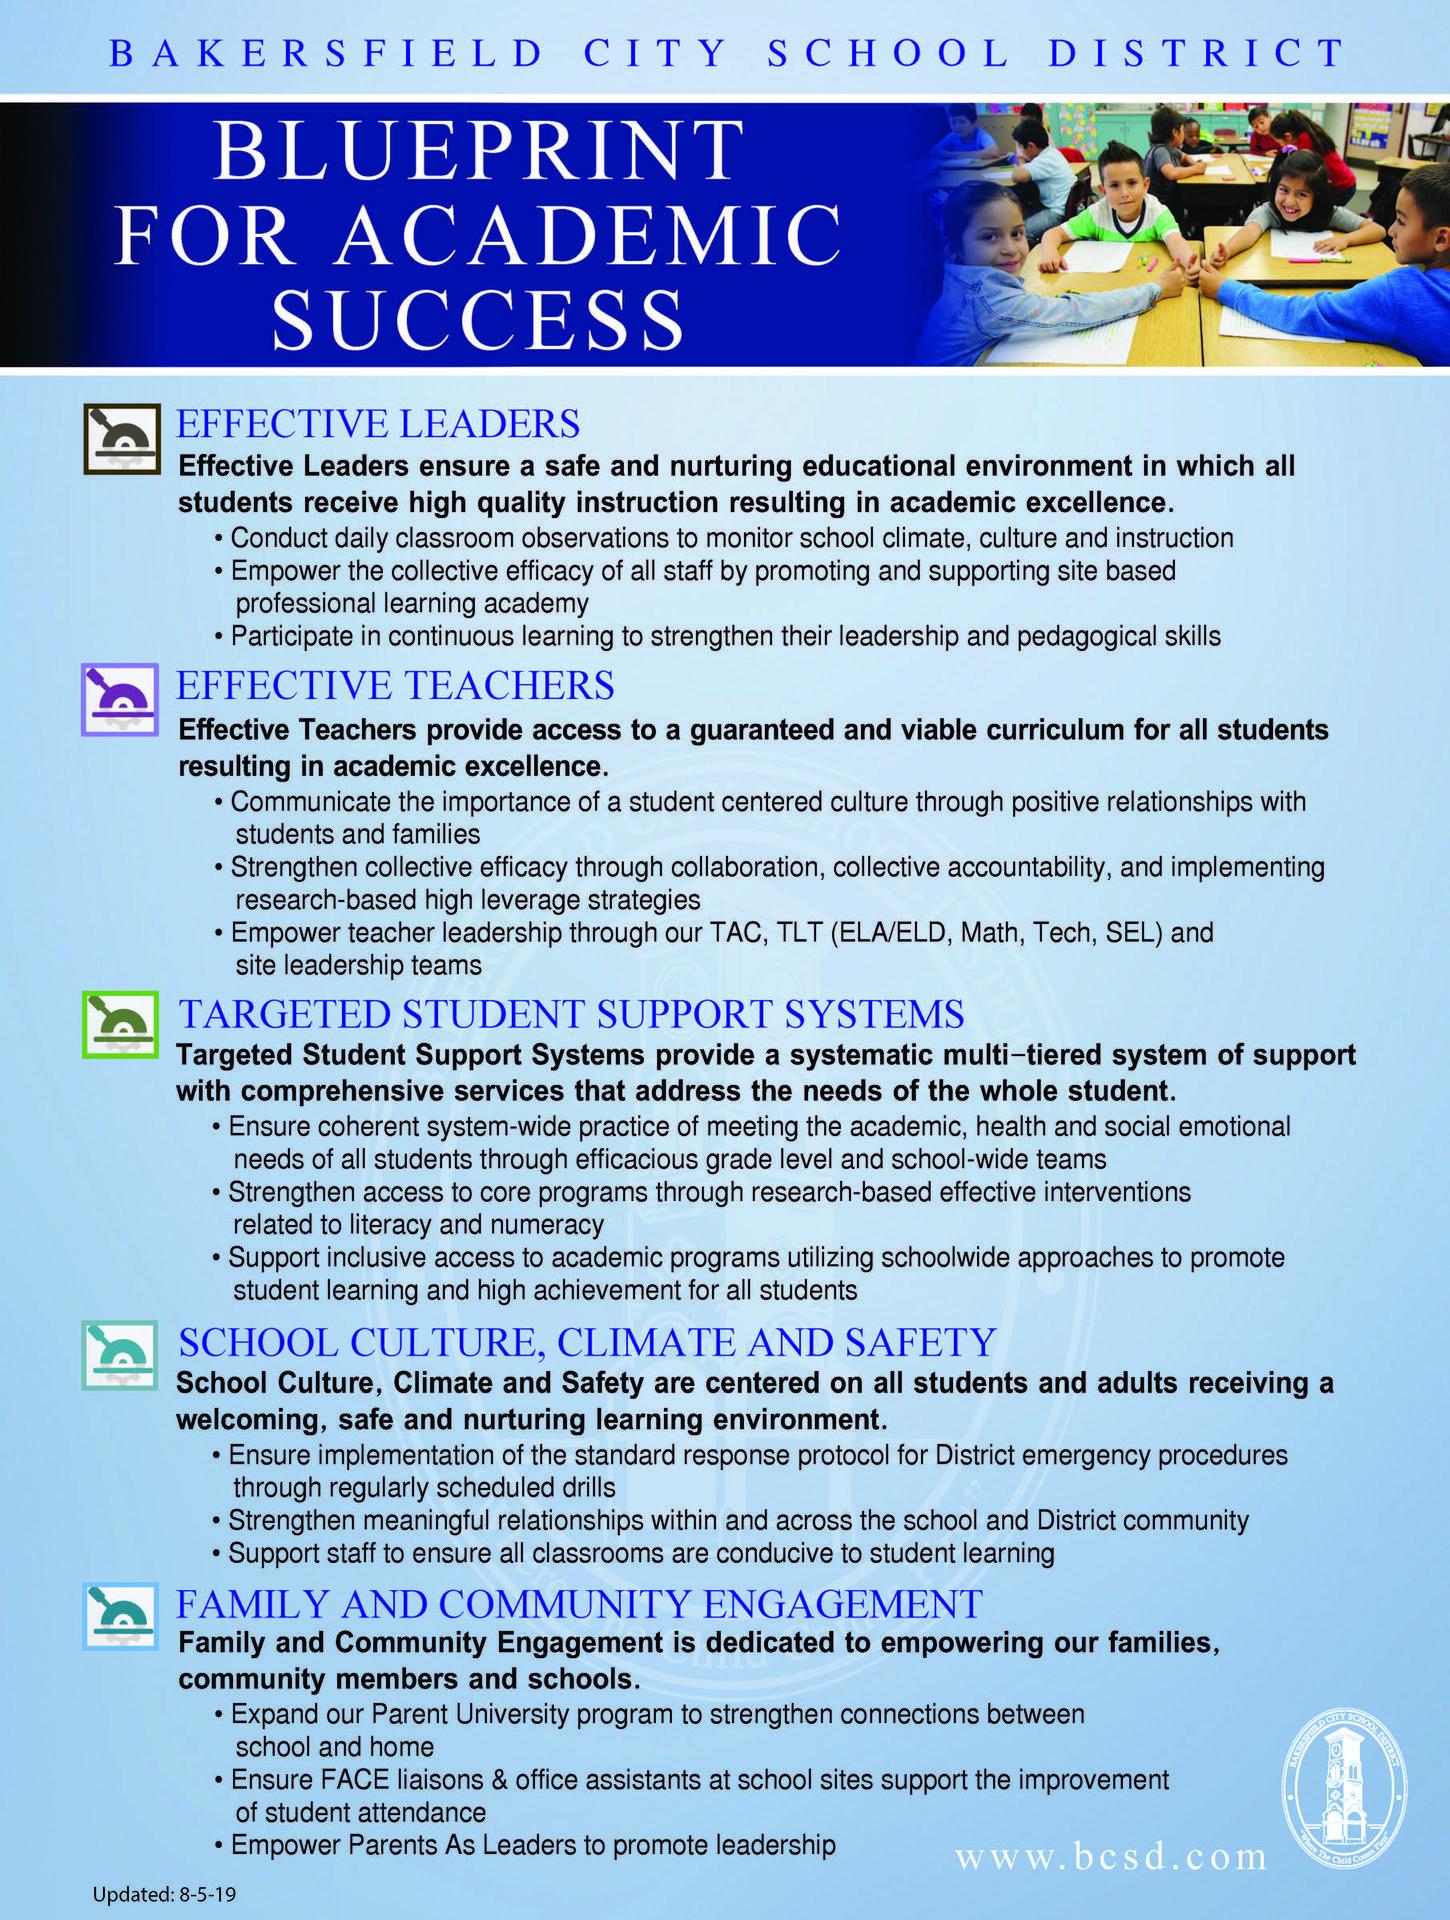 Blueprint for academic success